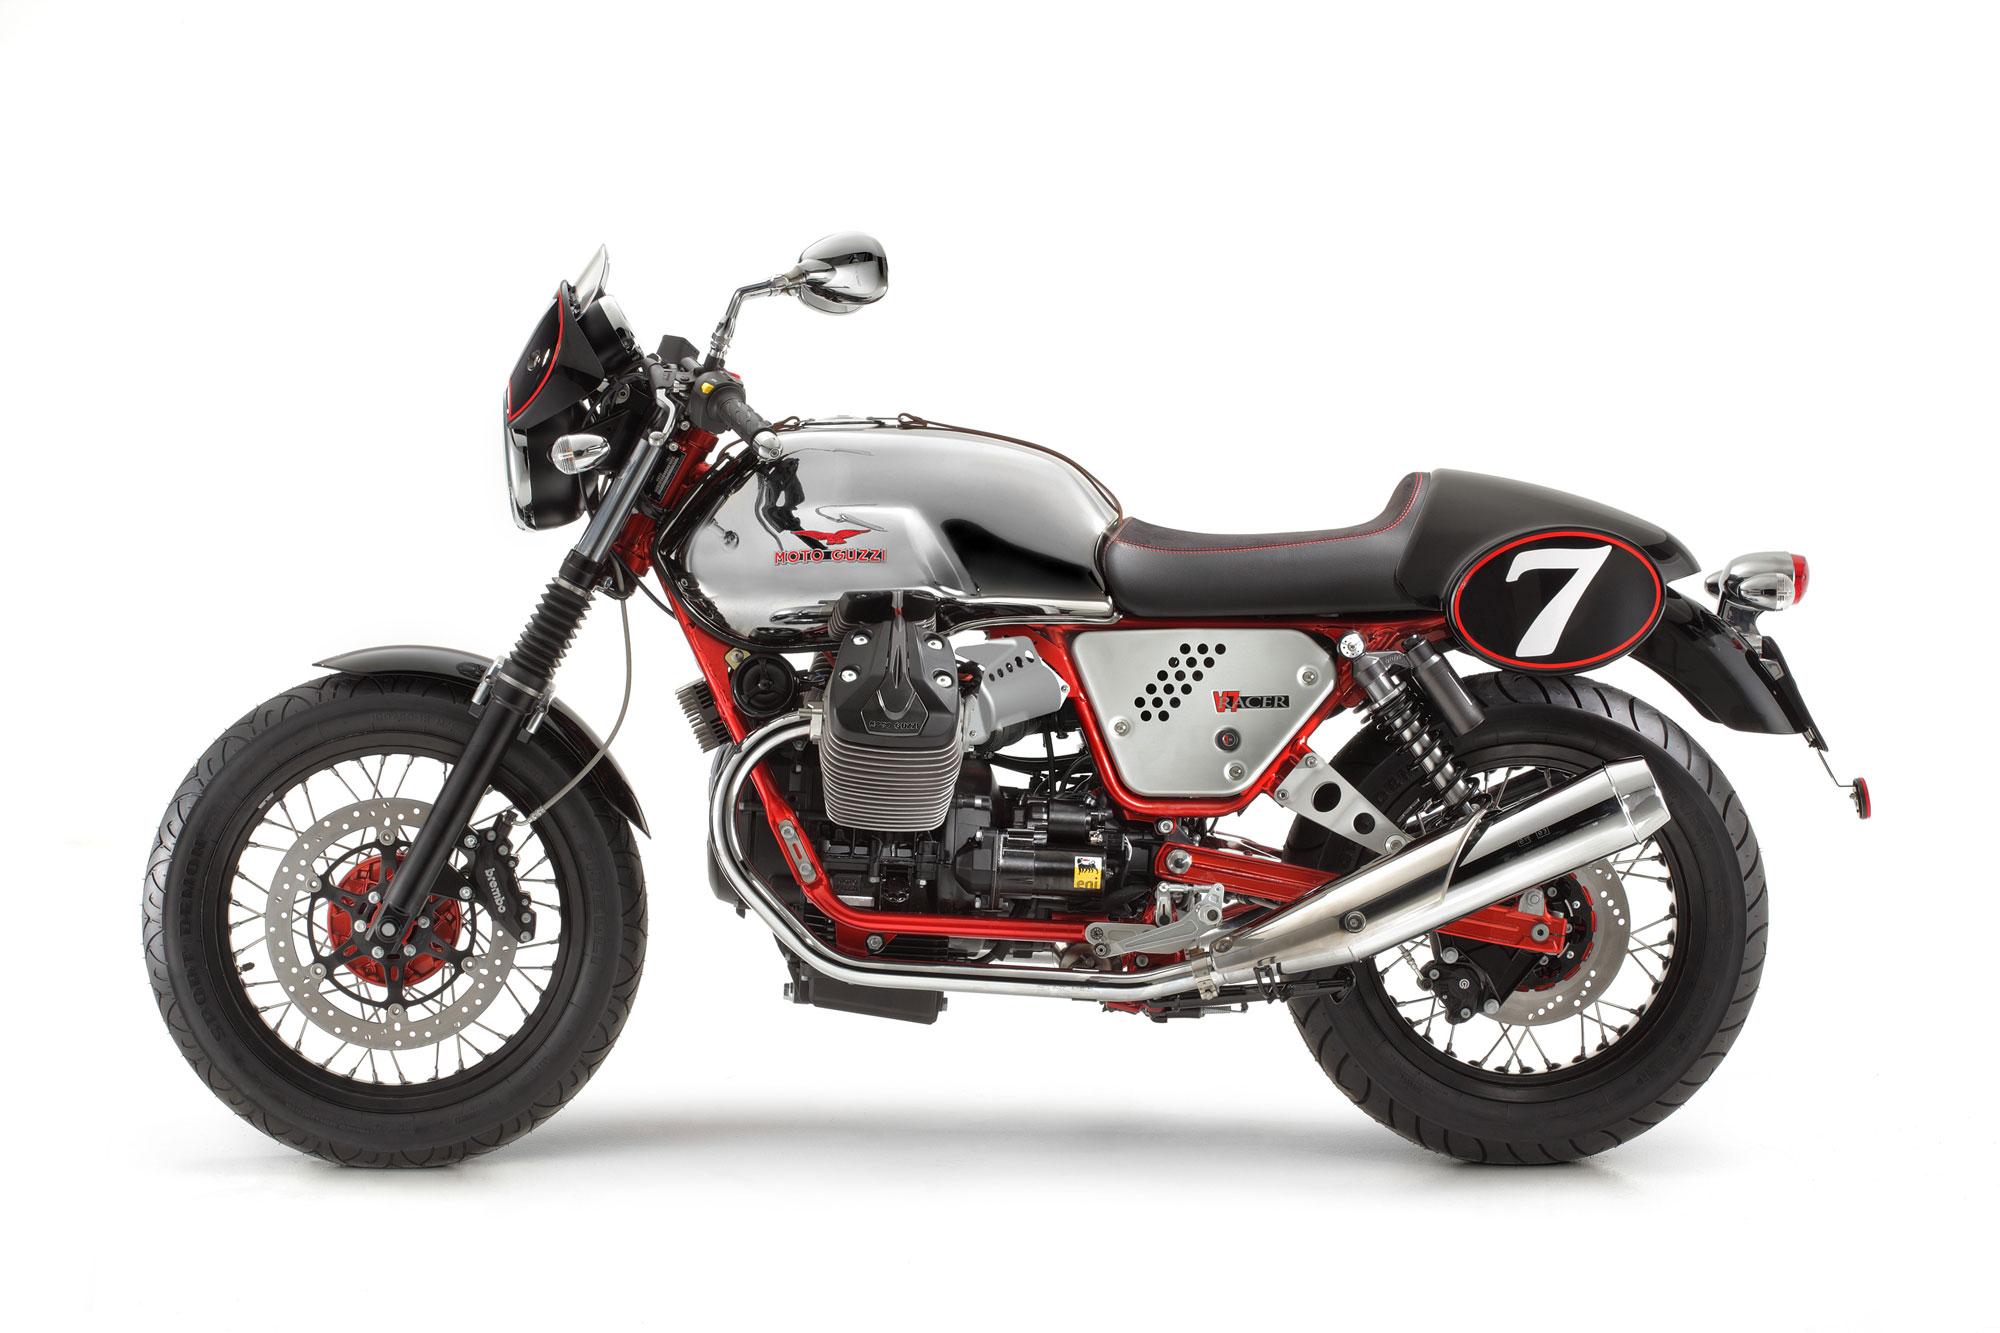 moto guzzi v7 racer specs 2012 2013 autoevolution. Black Bedroom Furniture Sets. Home Design Ideas